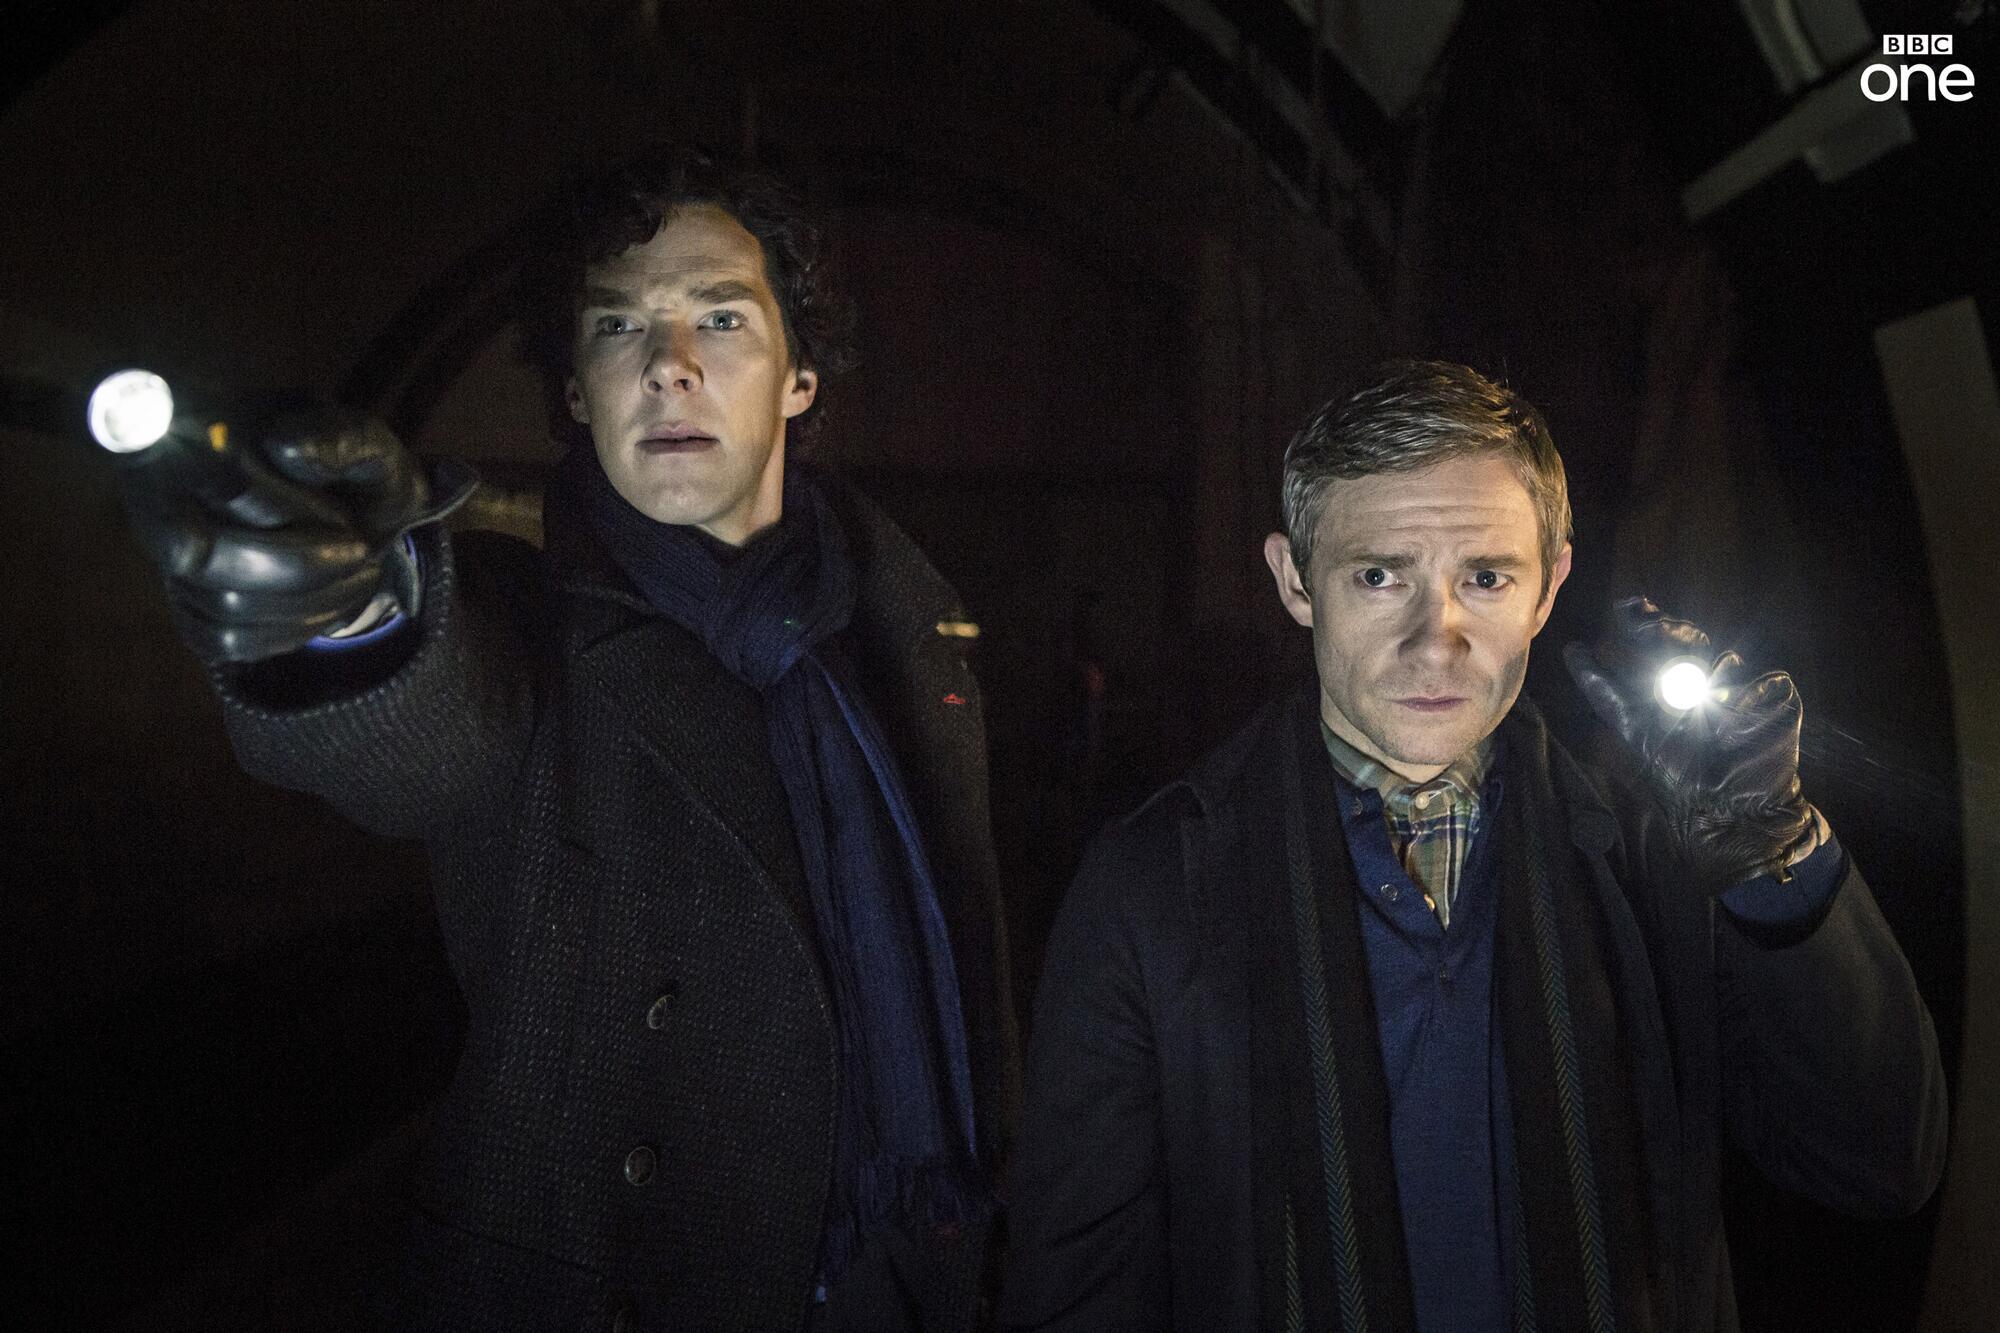 Twitter / BBCOne: Sherlock and Dr Watson explore ...